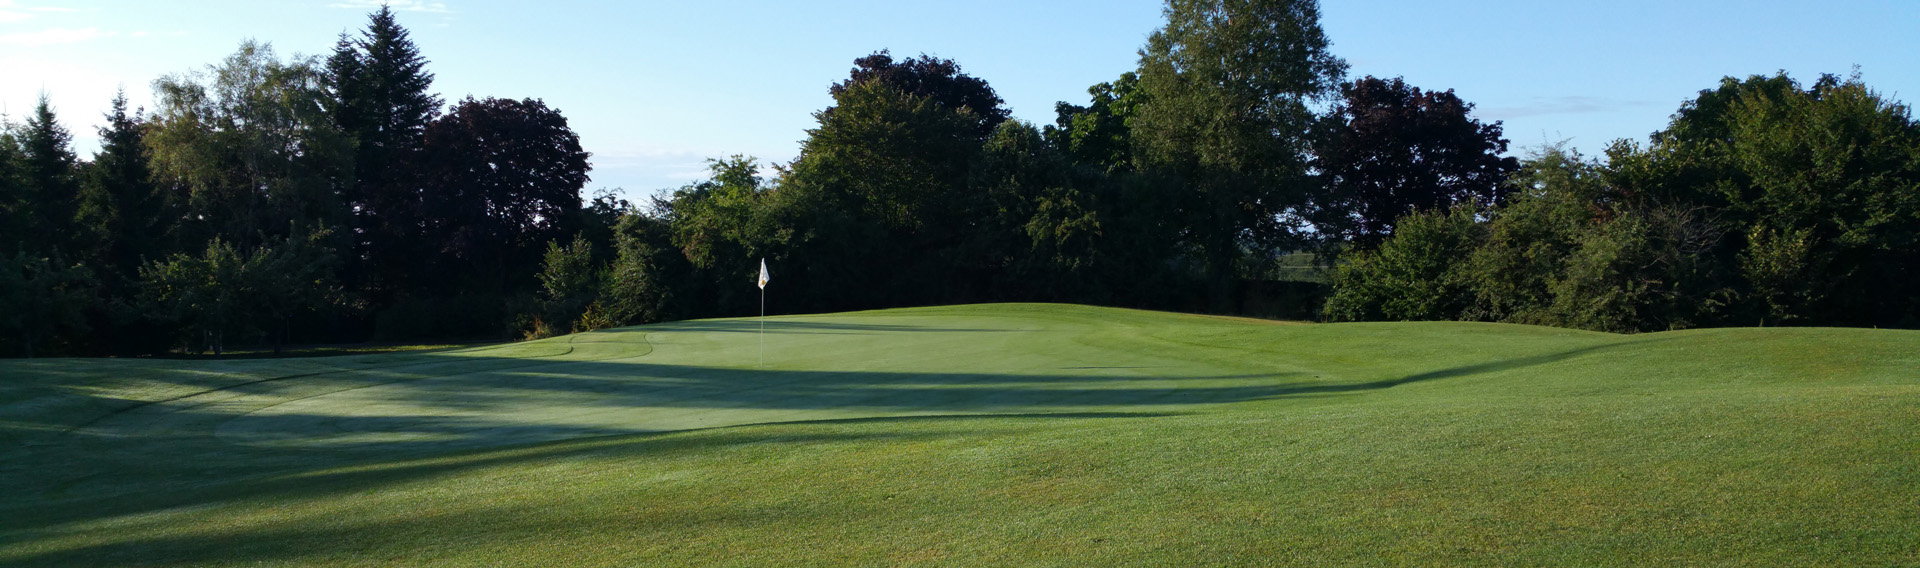 Golfclub_Rickenbach_Home_2